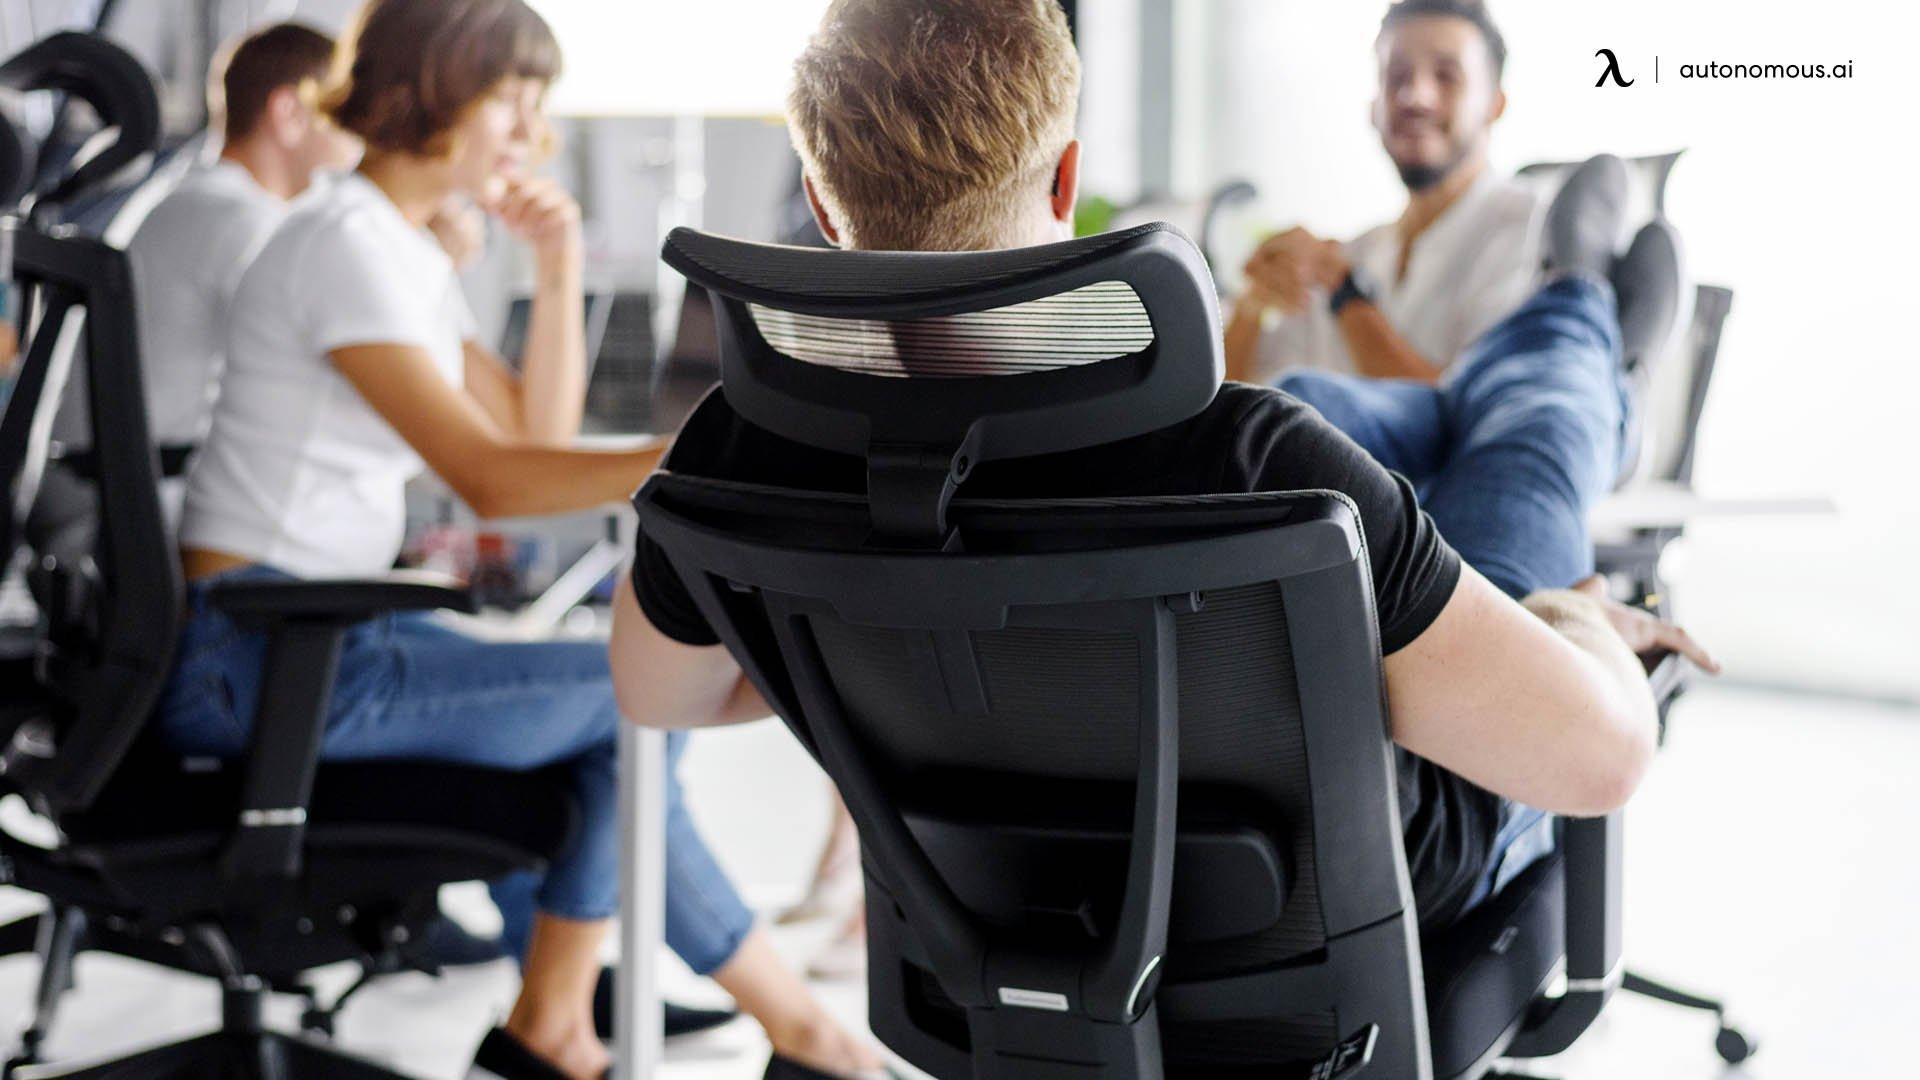 Backrest & headrest of office chair